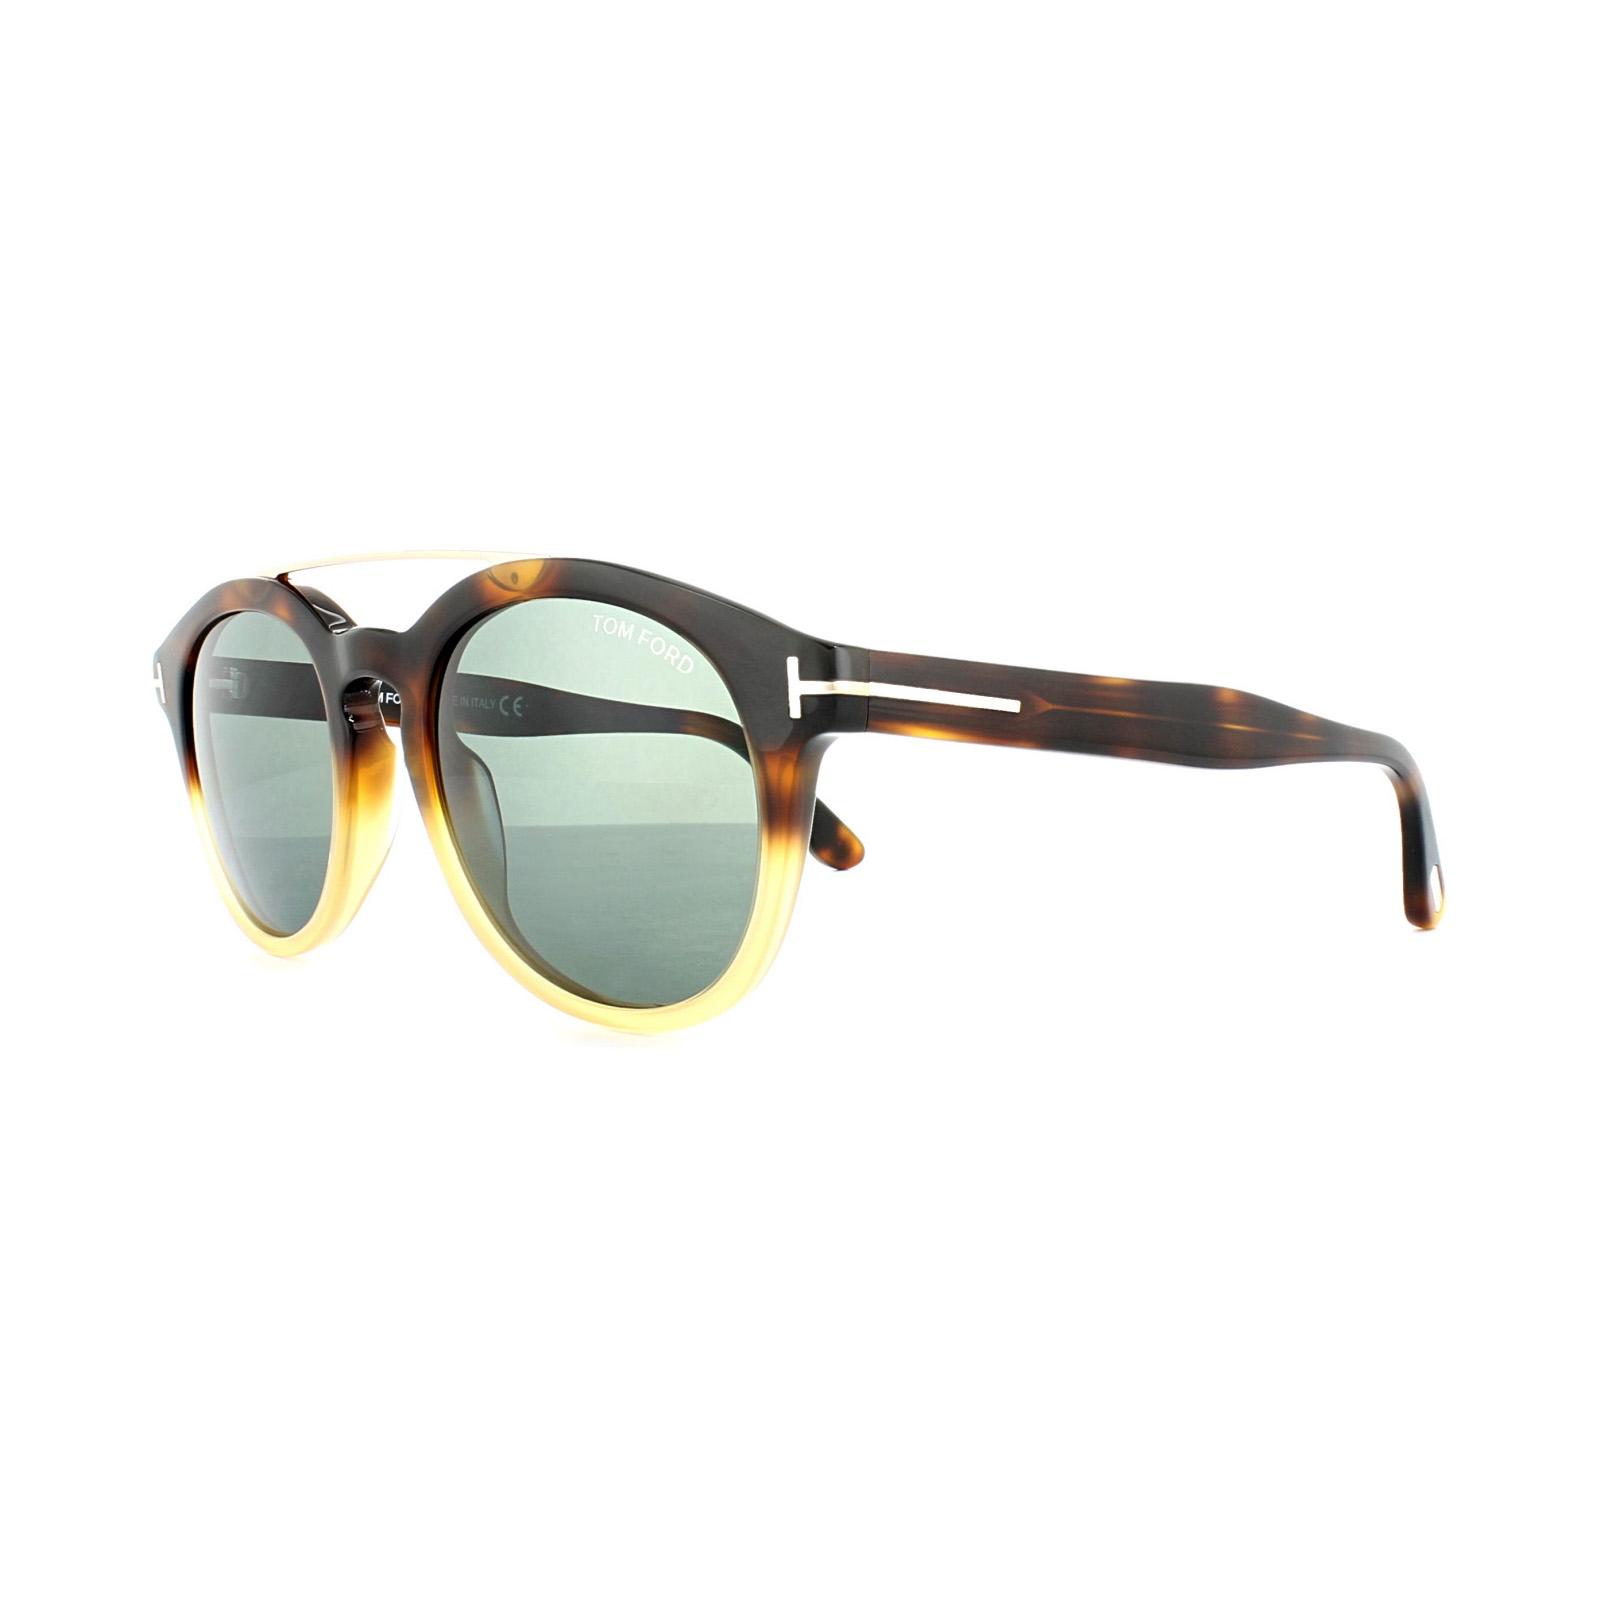 3afebbe0fa Sentinel Tom Ford Sunglasses 0515 Newman 56N Light Havana Fade Green